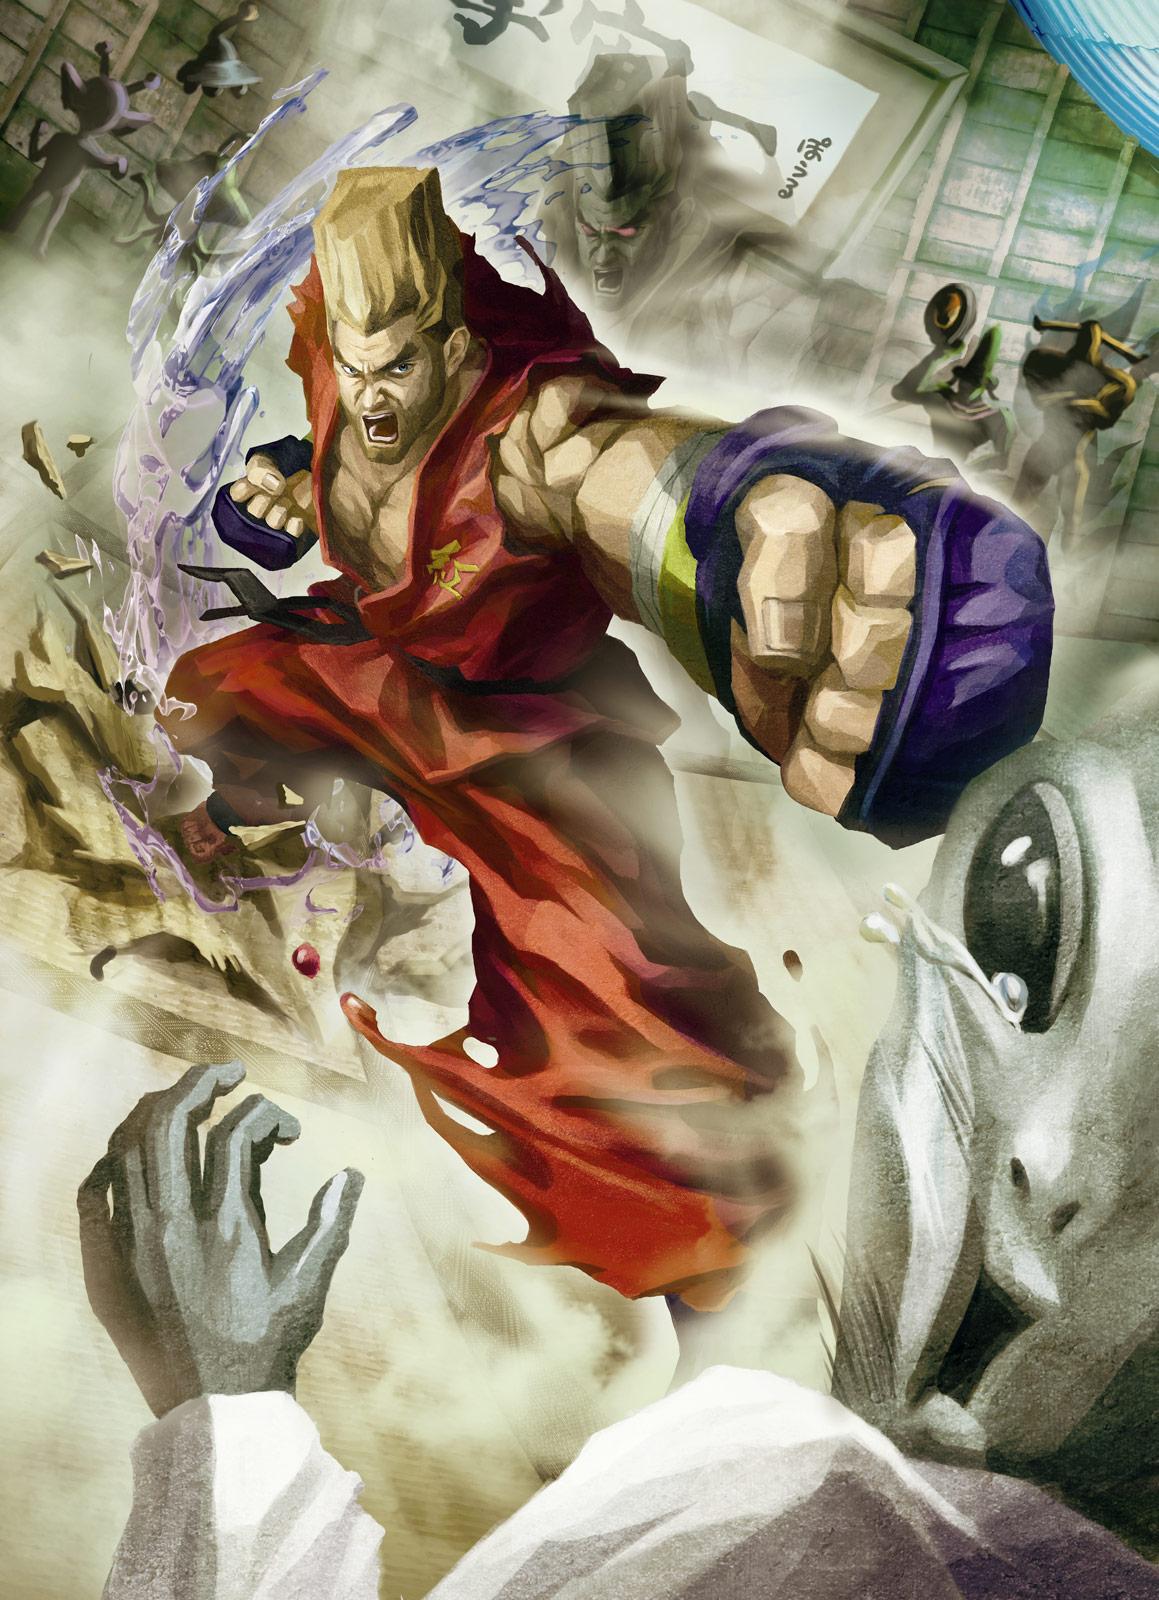 Street Fighter X Tekken artwork Balrog, Vega, Juri, Paul, Law & Xiaoyu #12